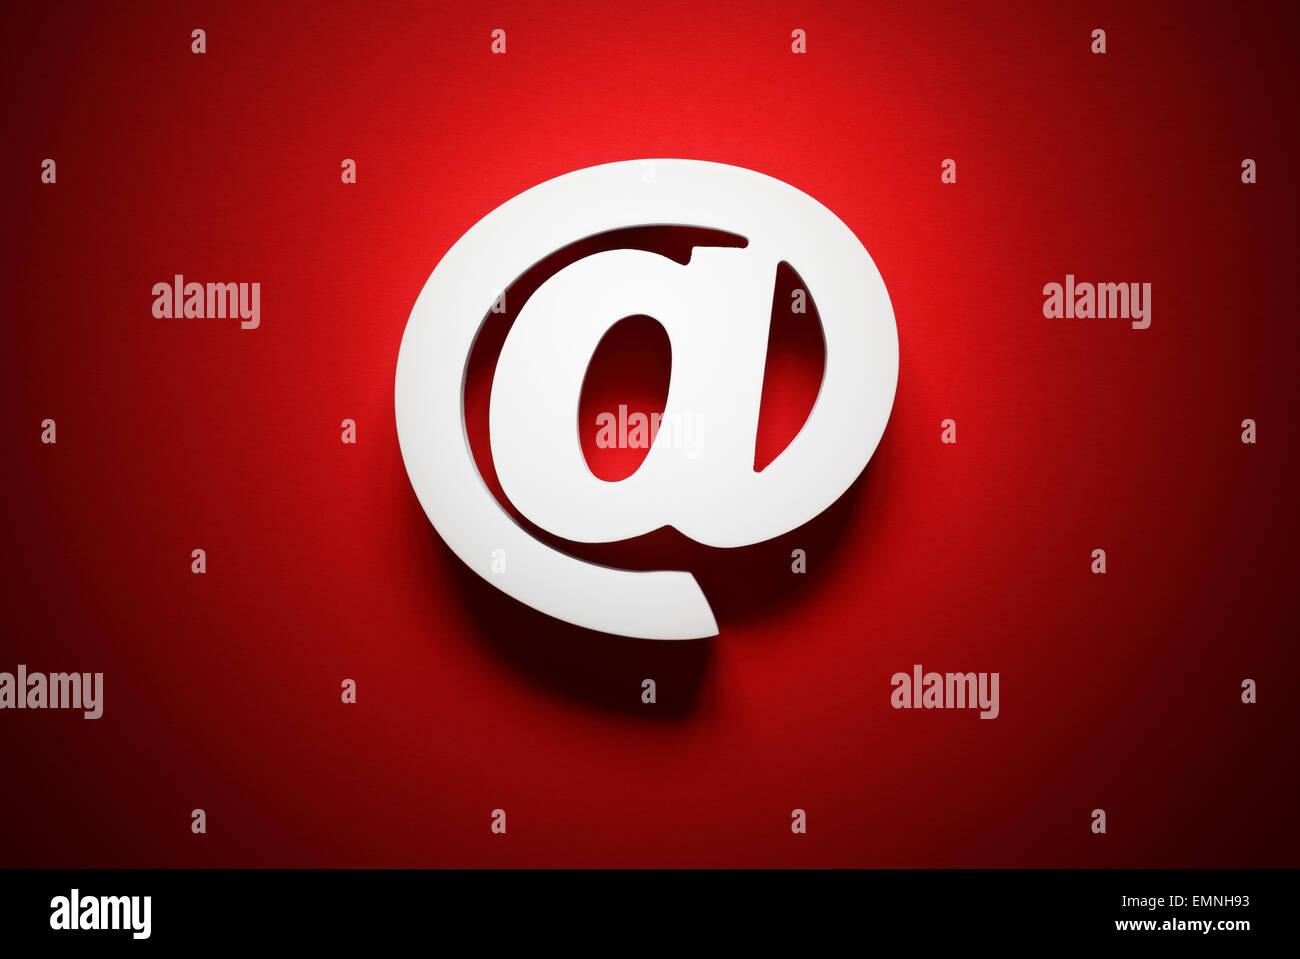 Email symbol - Stock Image